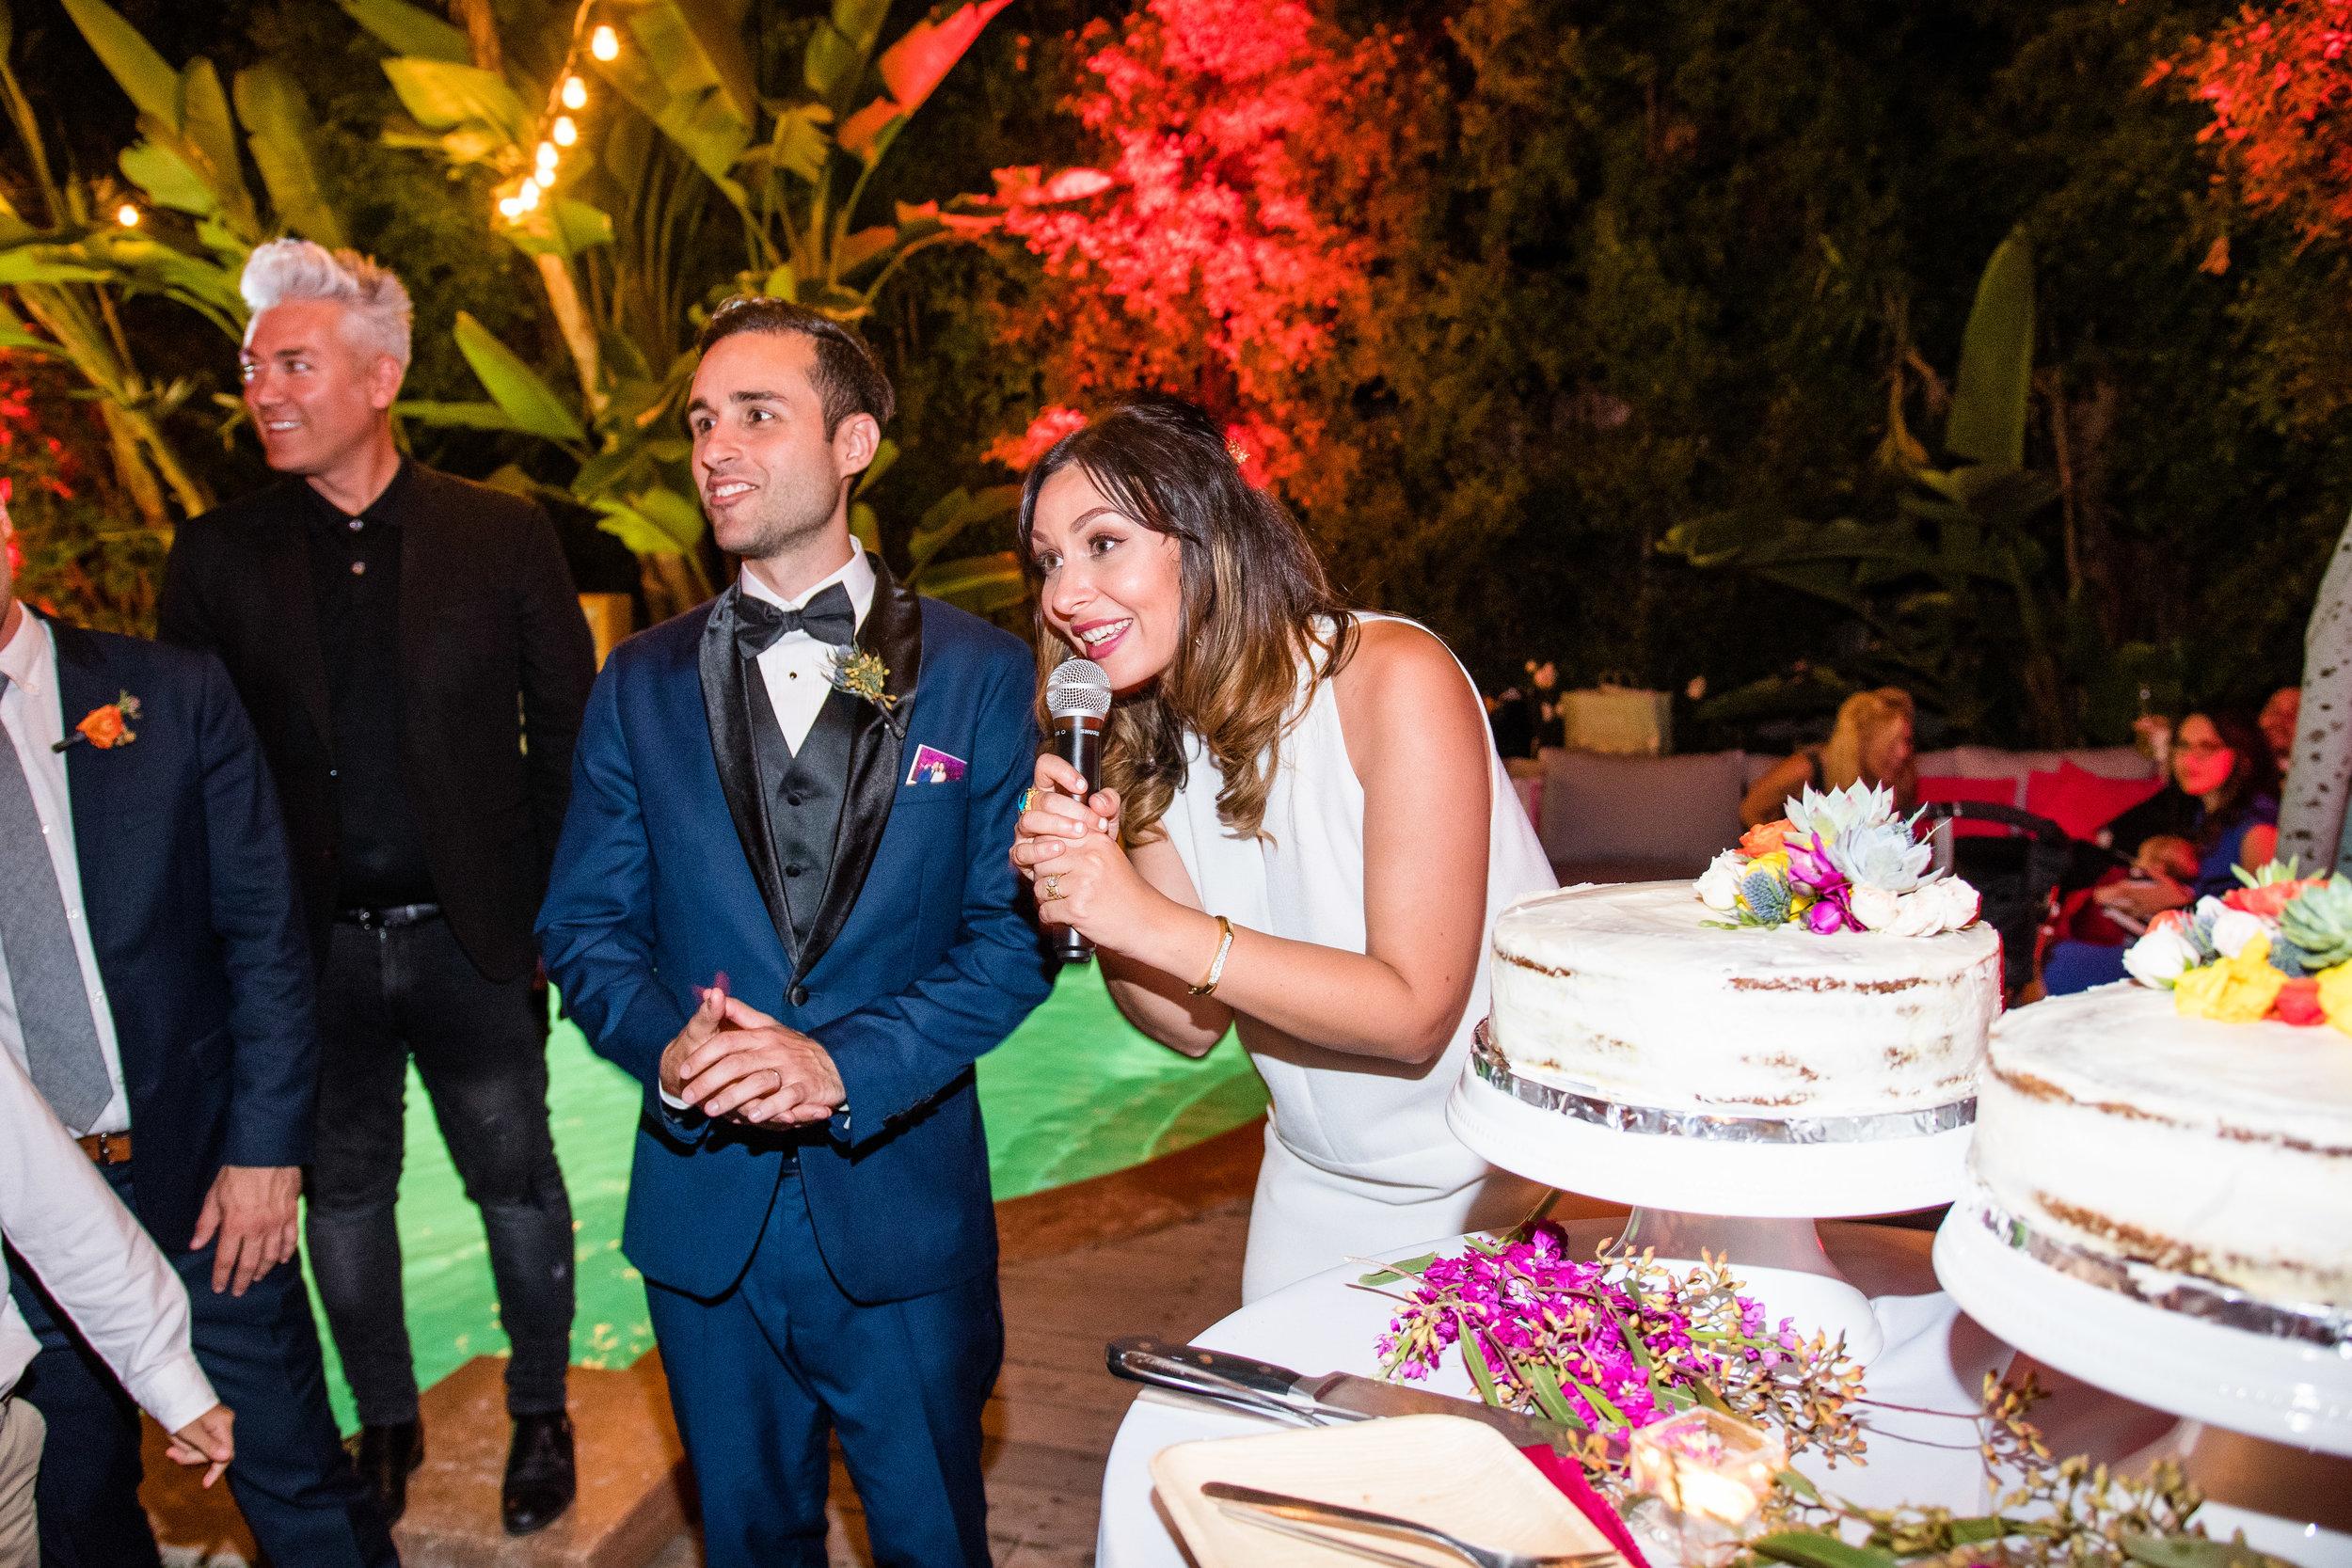 Vibrant Fiesta Backyard Wedding Reception bride and groom making speech at cake cutting.jpg